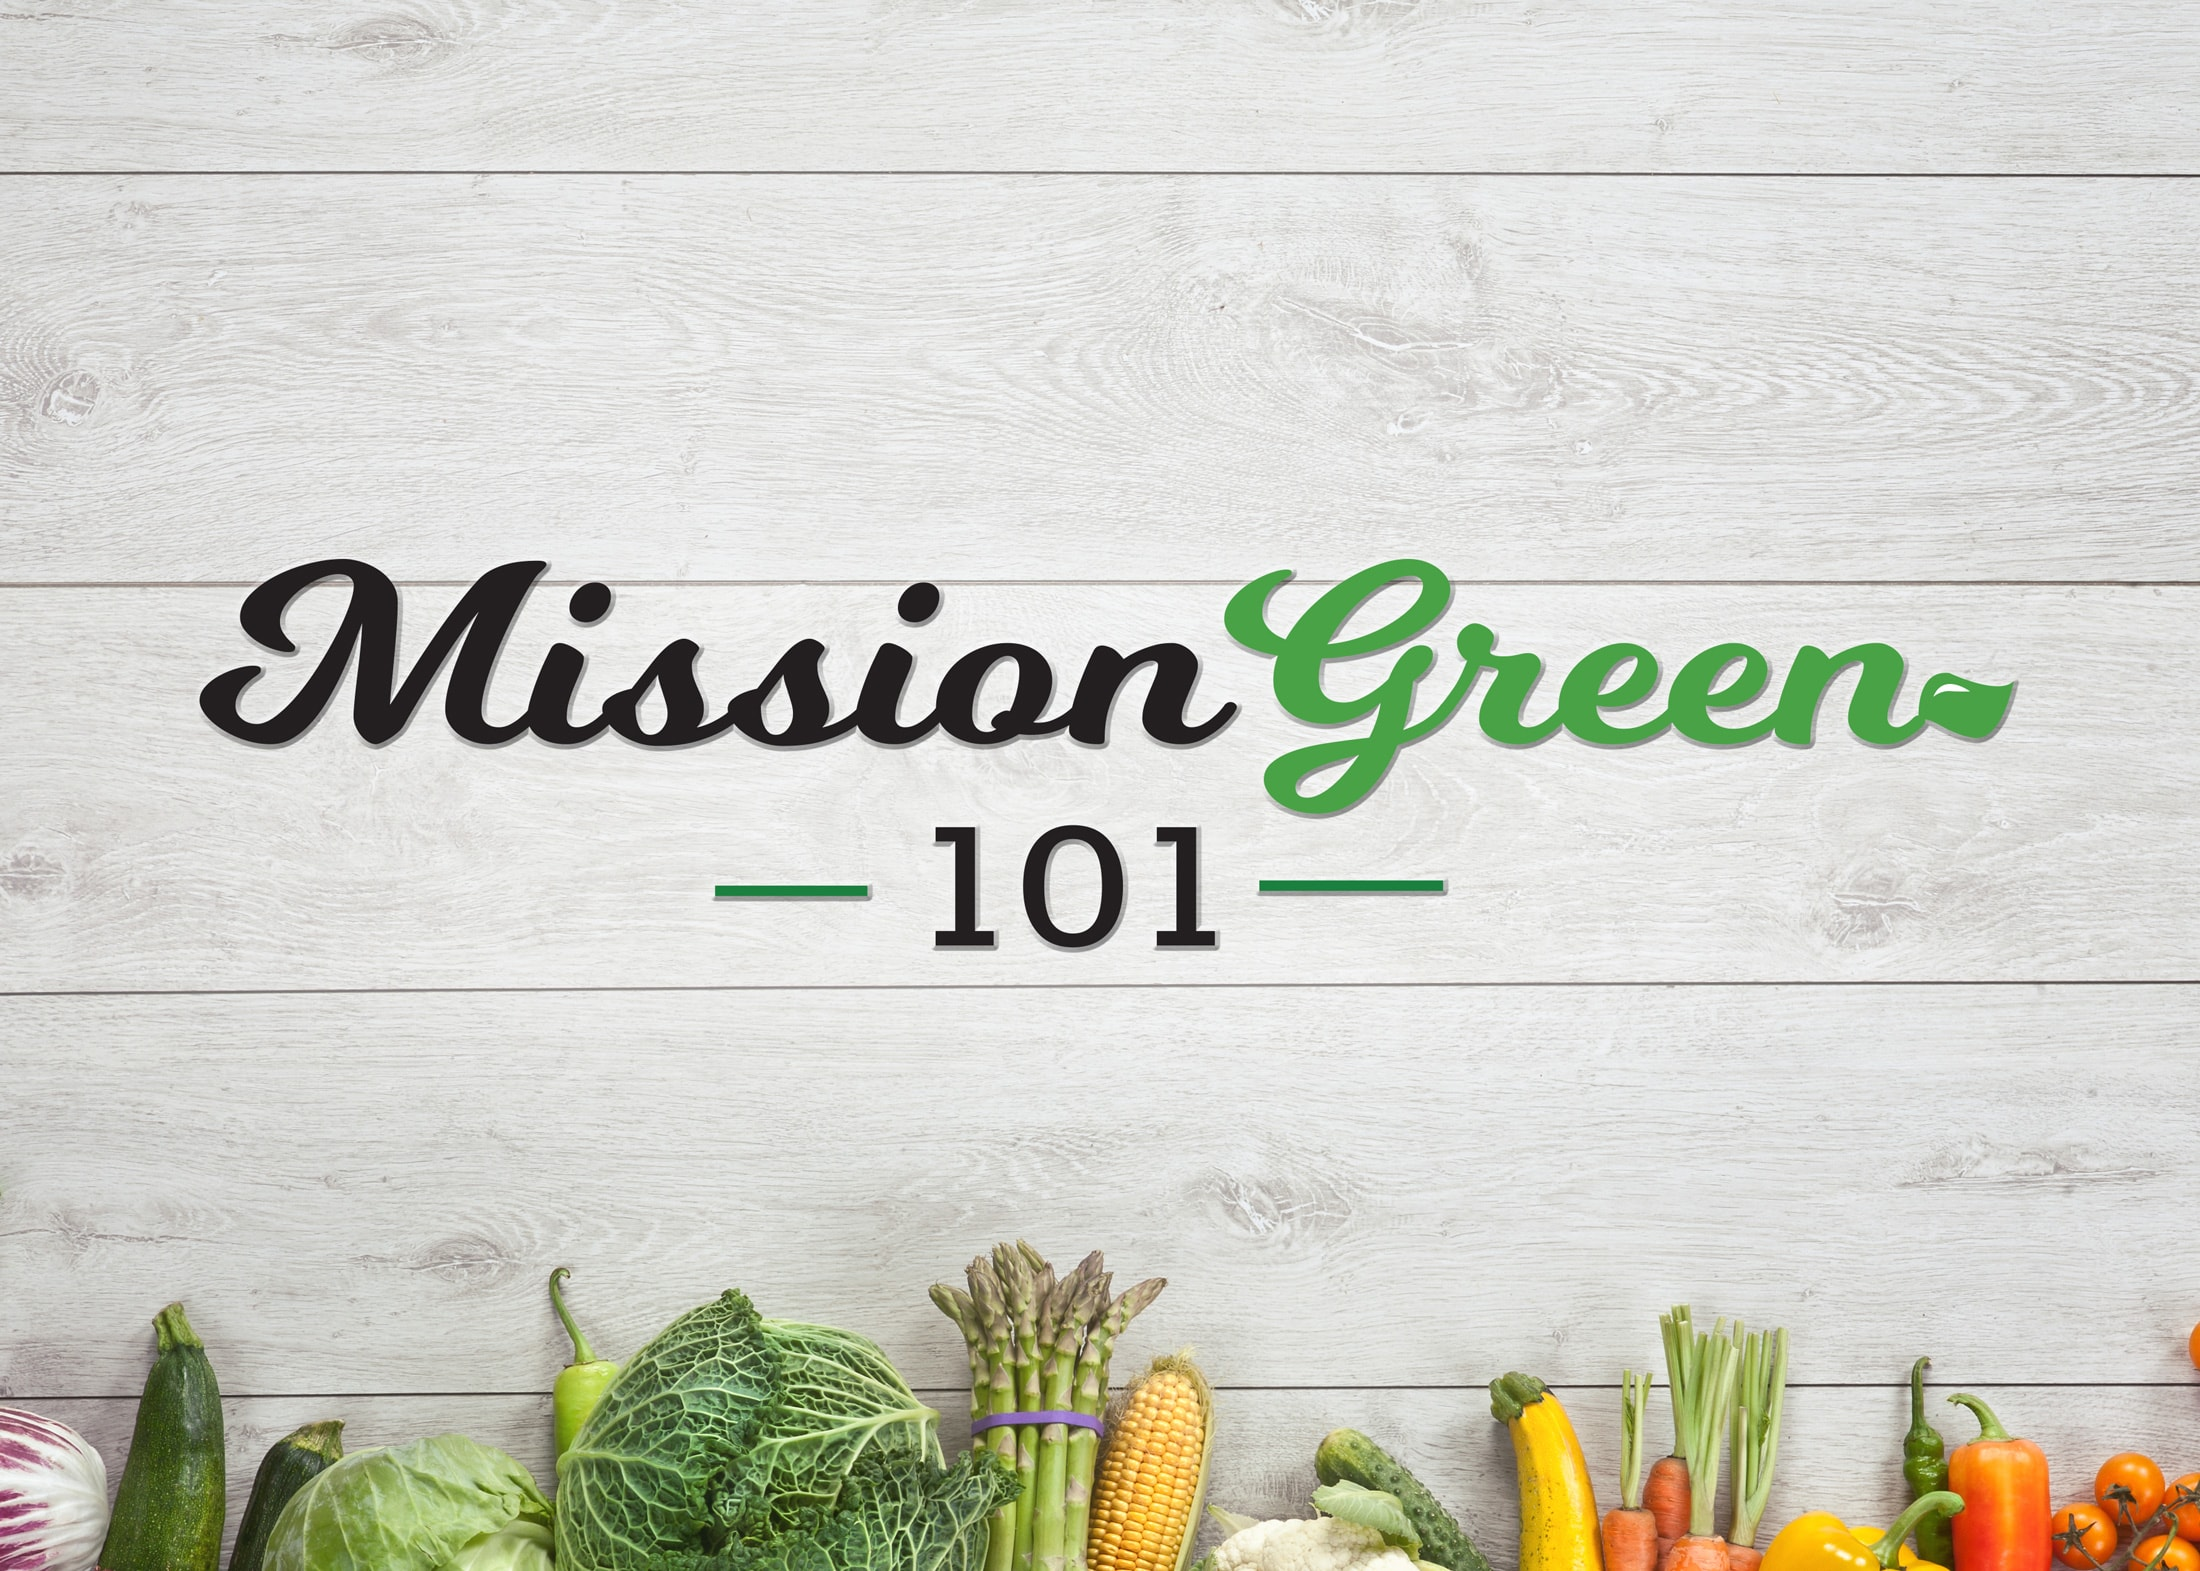 mission-green-final-main-logo-vegetables